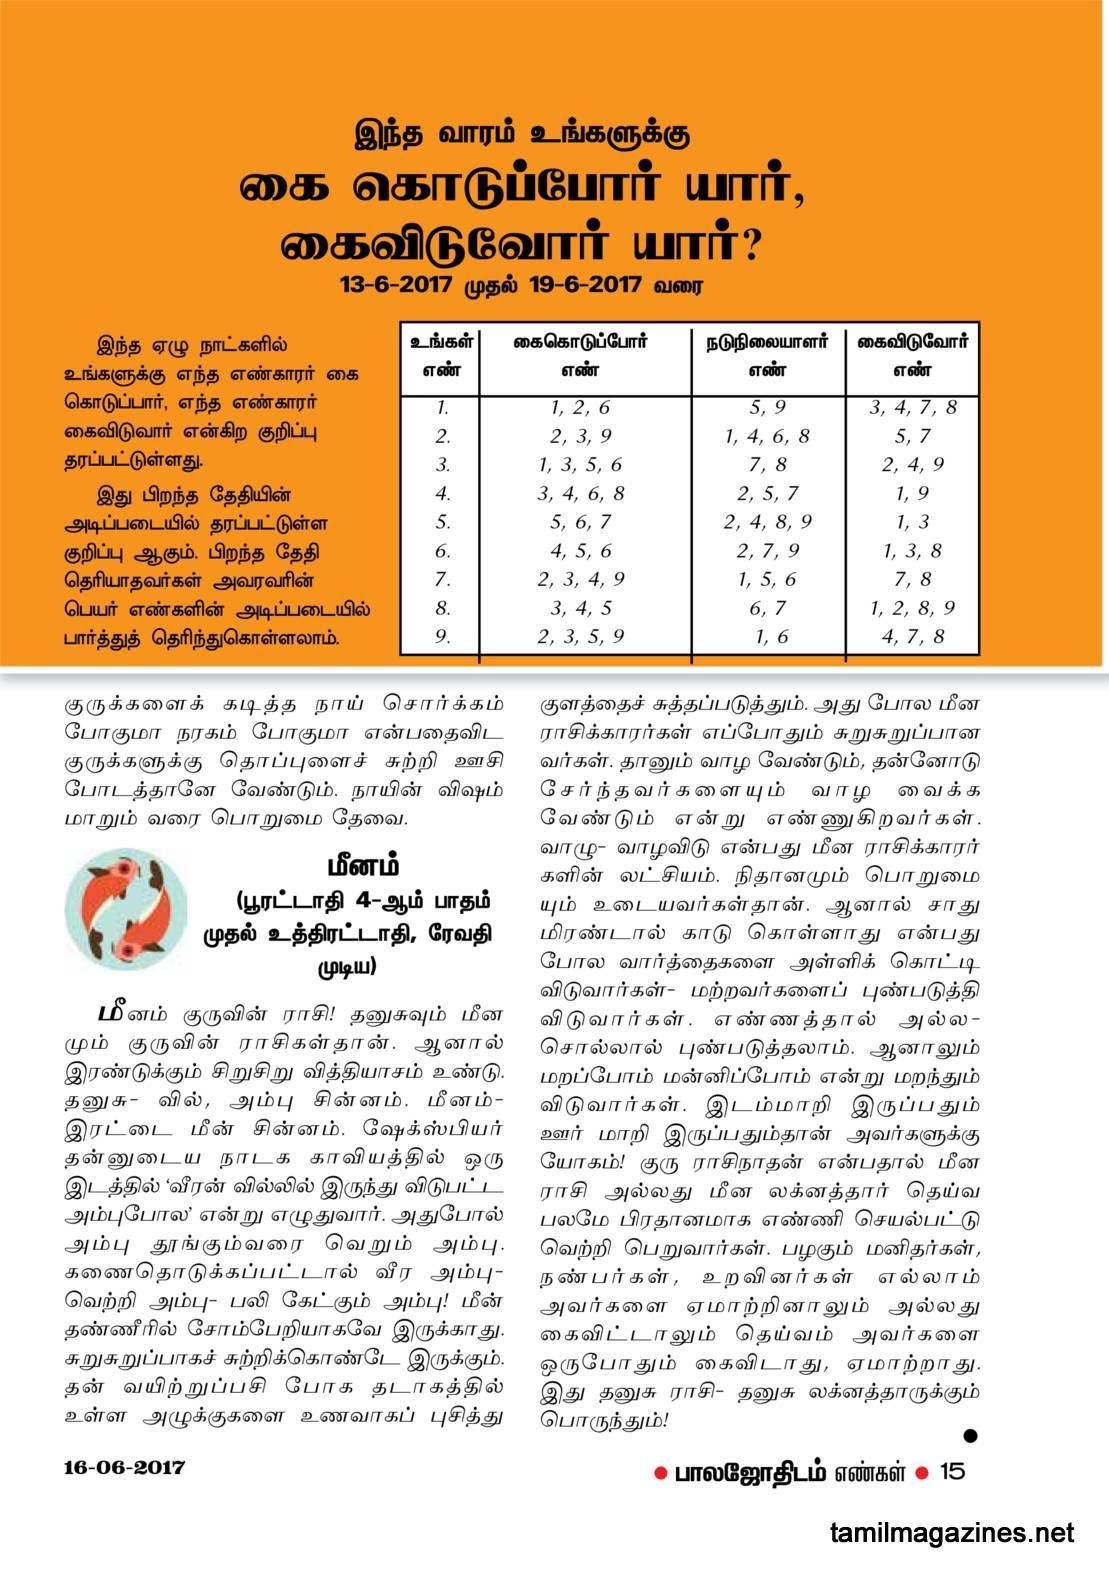 Balajothidam Raasi Palan June 13-19, 2017